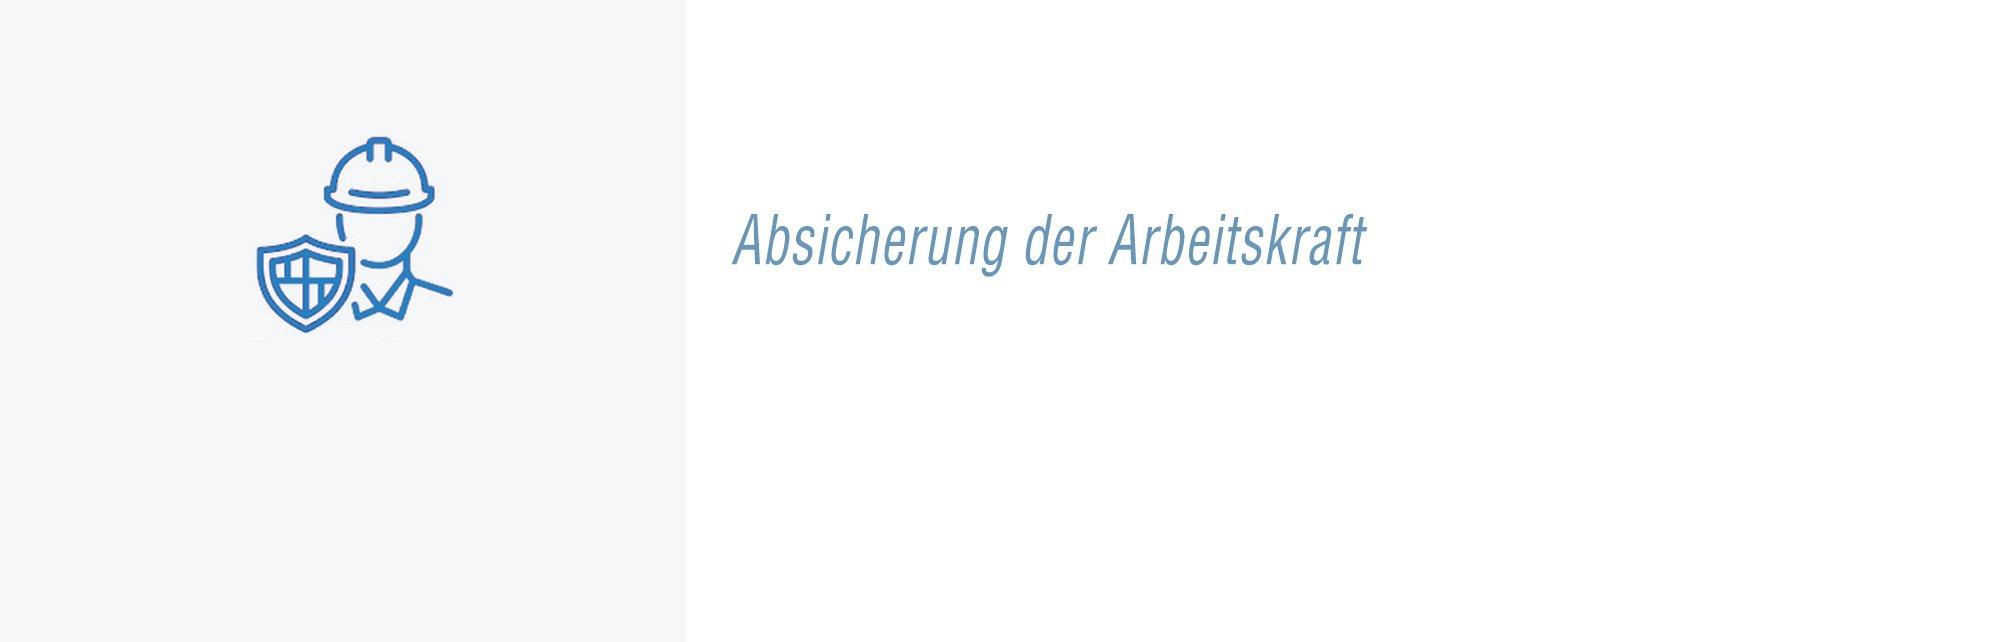 Arbeitskraftabsicherung genossenschaft berlin